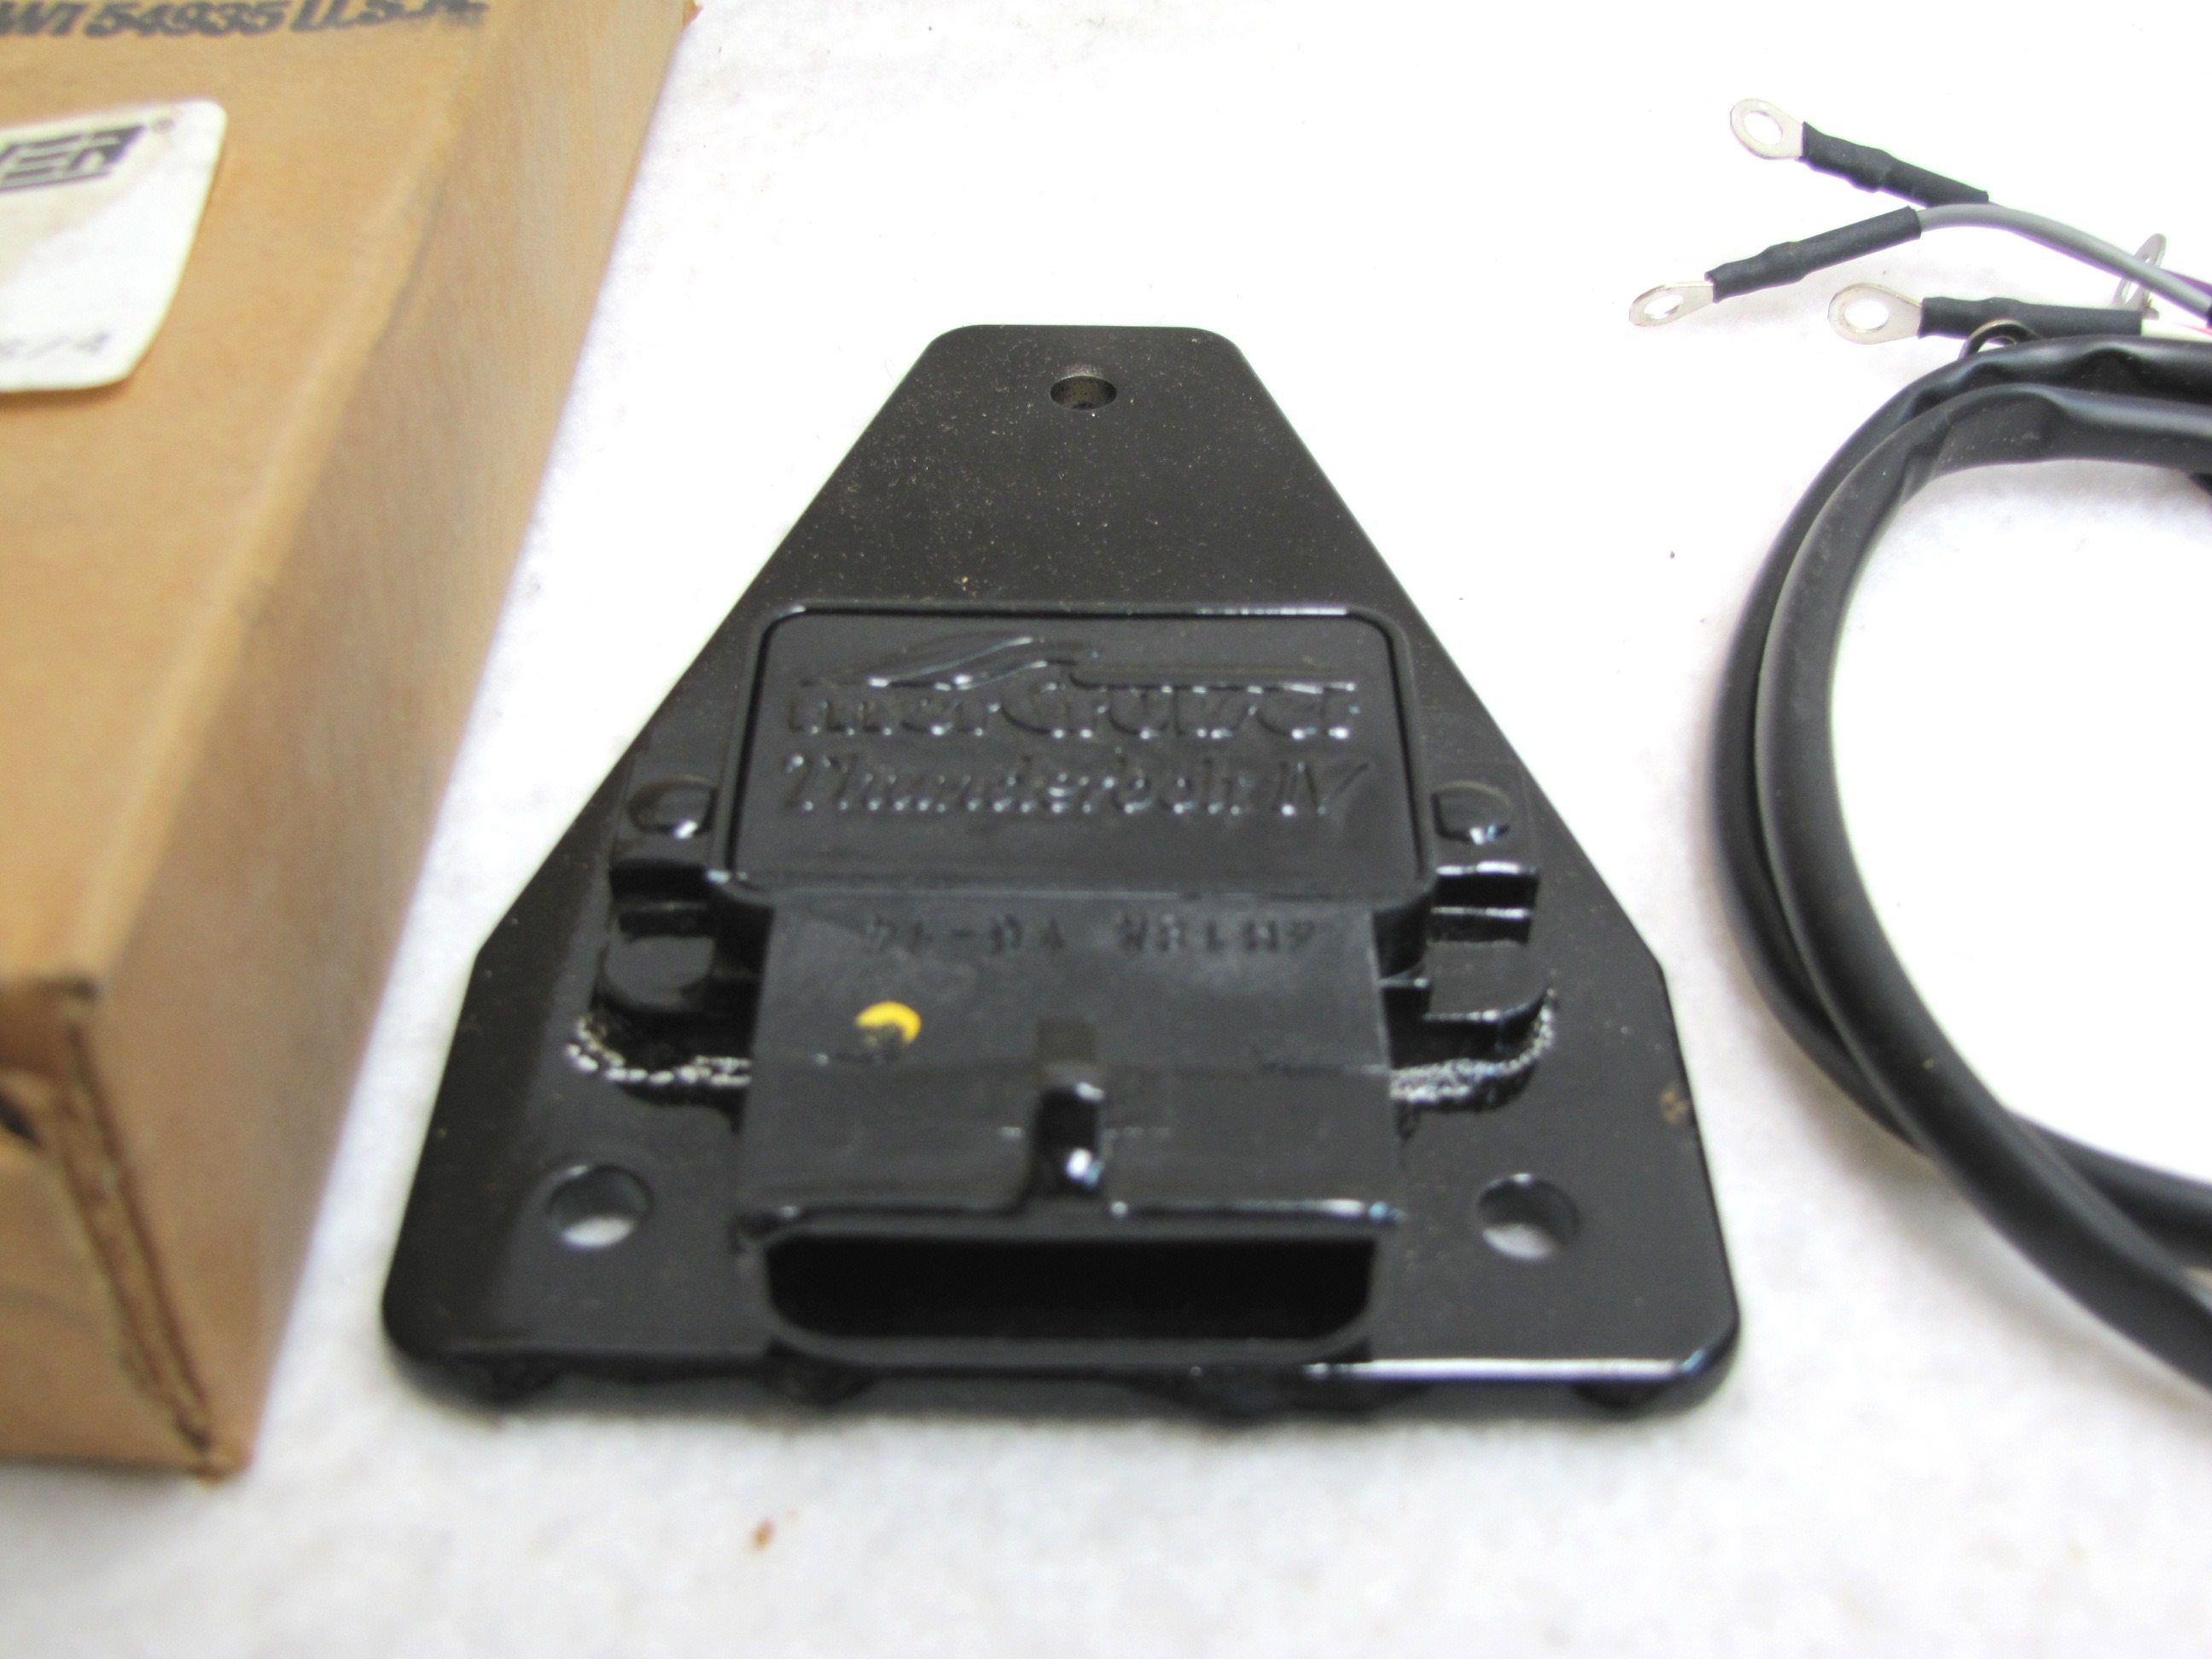 IMG_7834 Quicksilver Outboard Controls Wiring Diagram on 70 hp mercury, yamaha 2 stroke 40 hp, 35 hp mercury, 20 hp mercury, yamaha 4 stroke, mercury v6,